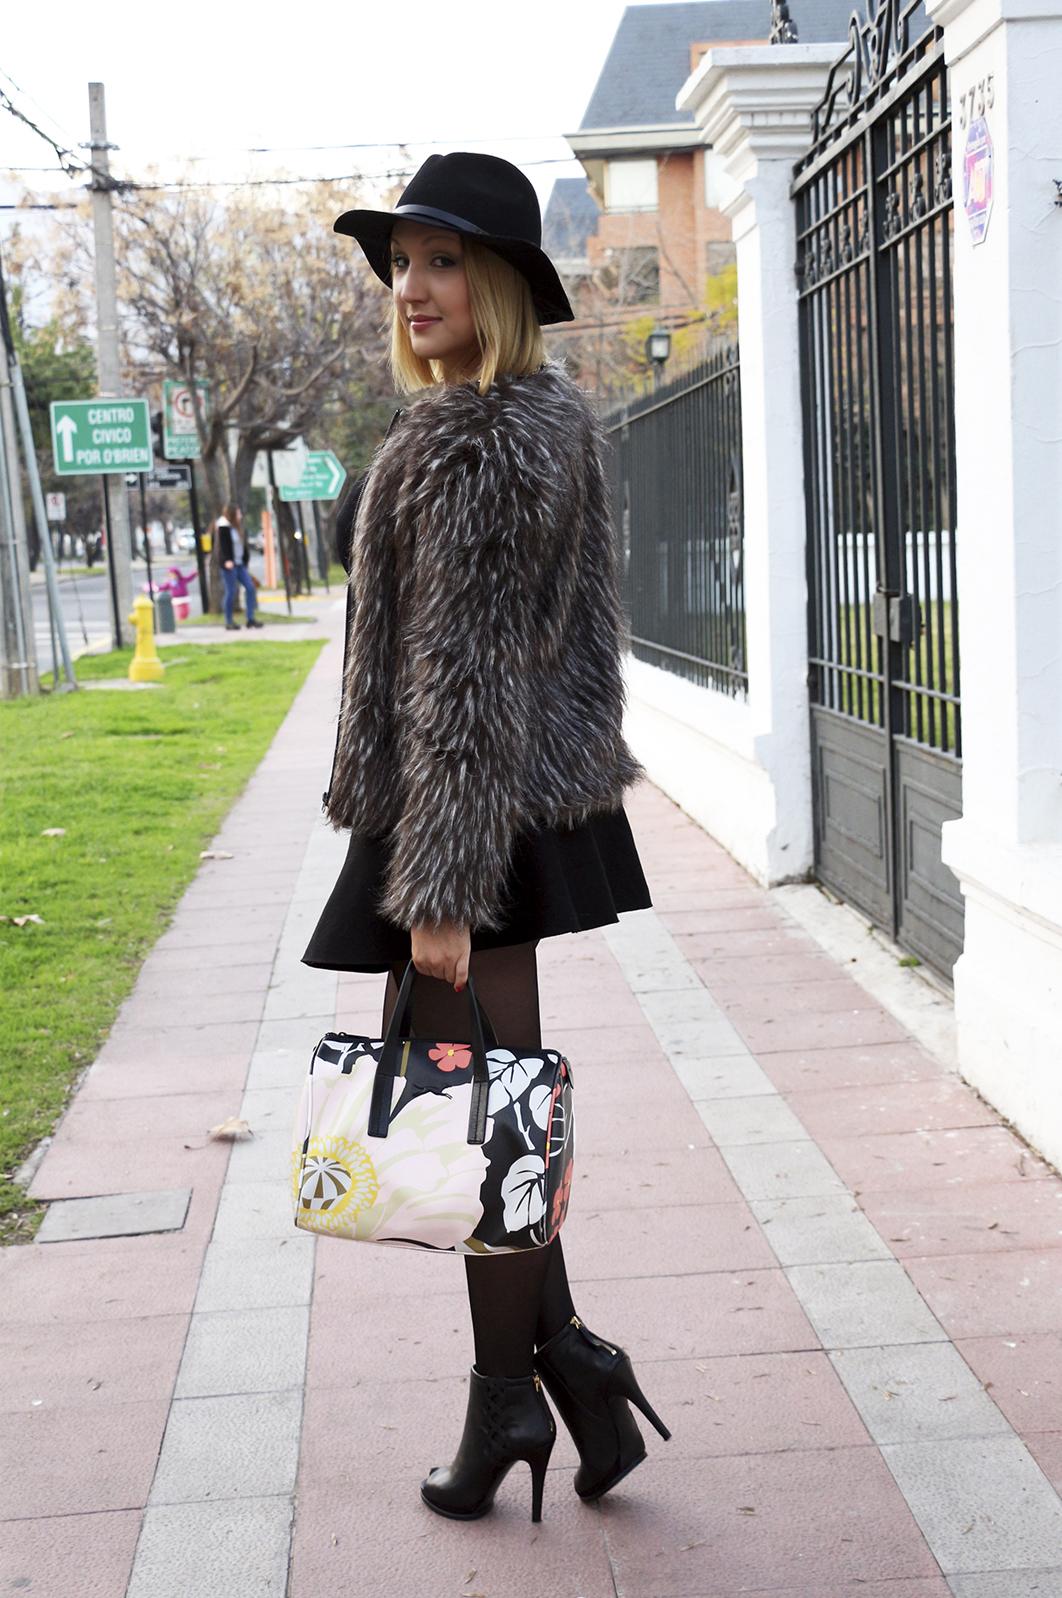 peludos-mas-presentes-que-nunca-streetstyle-tu-guia-fashion-4